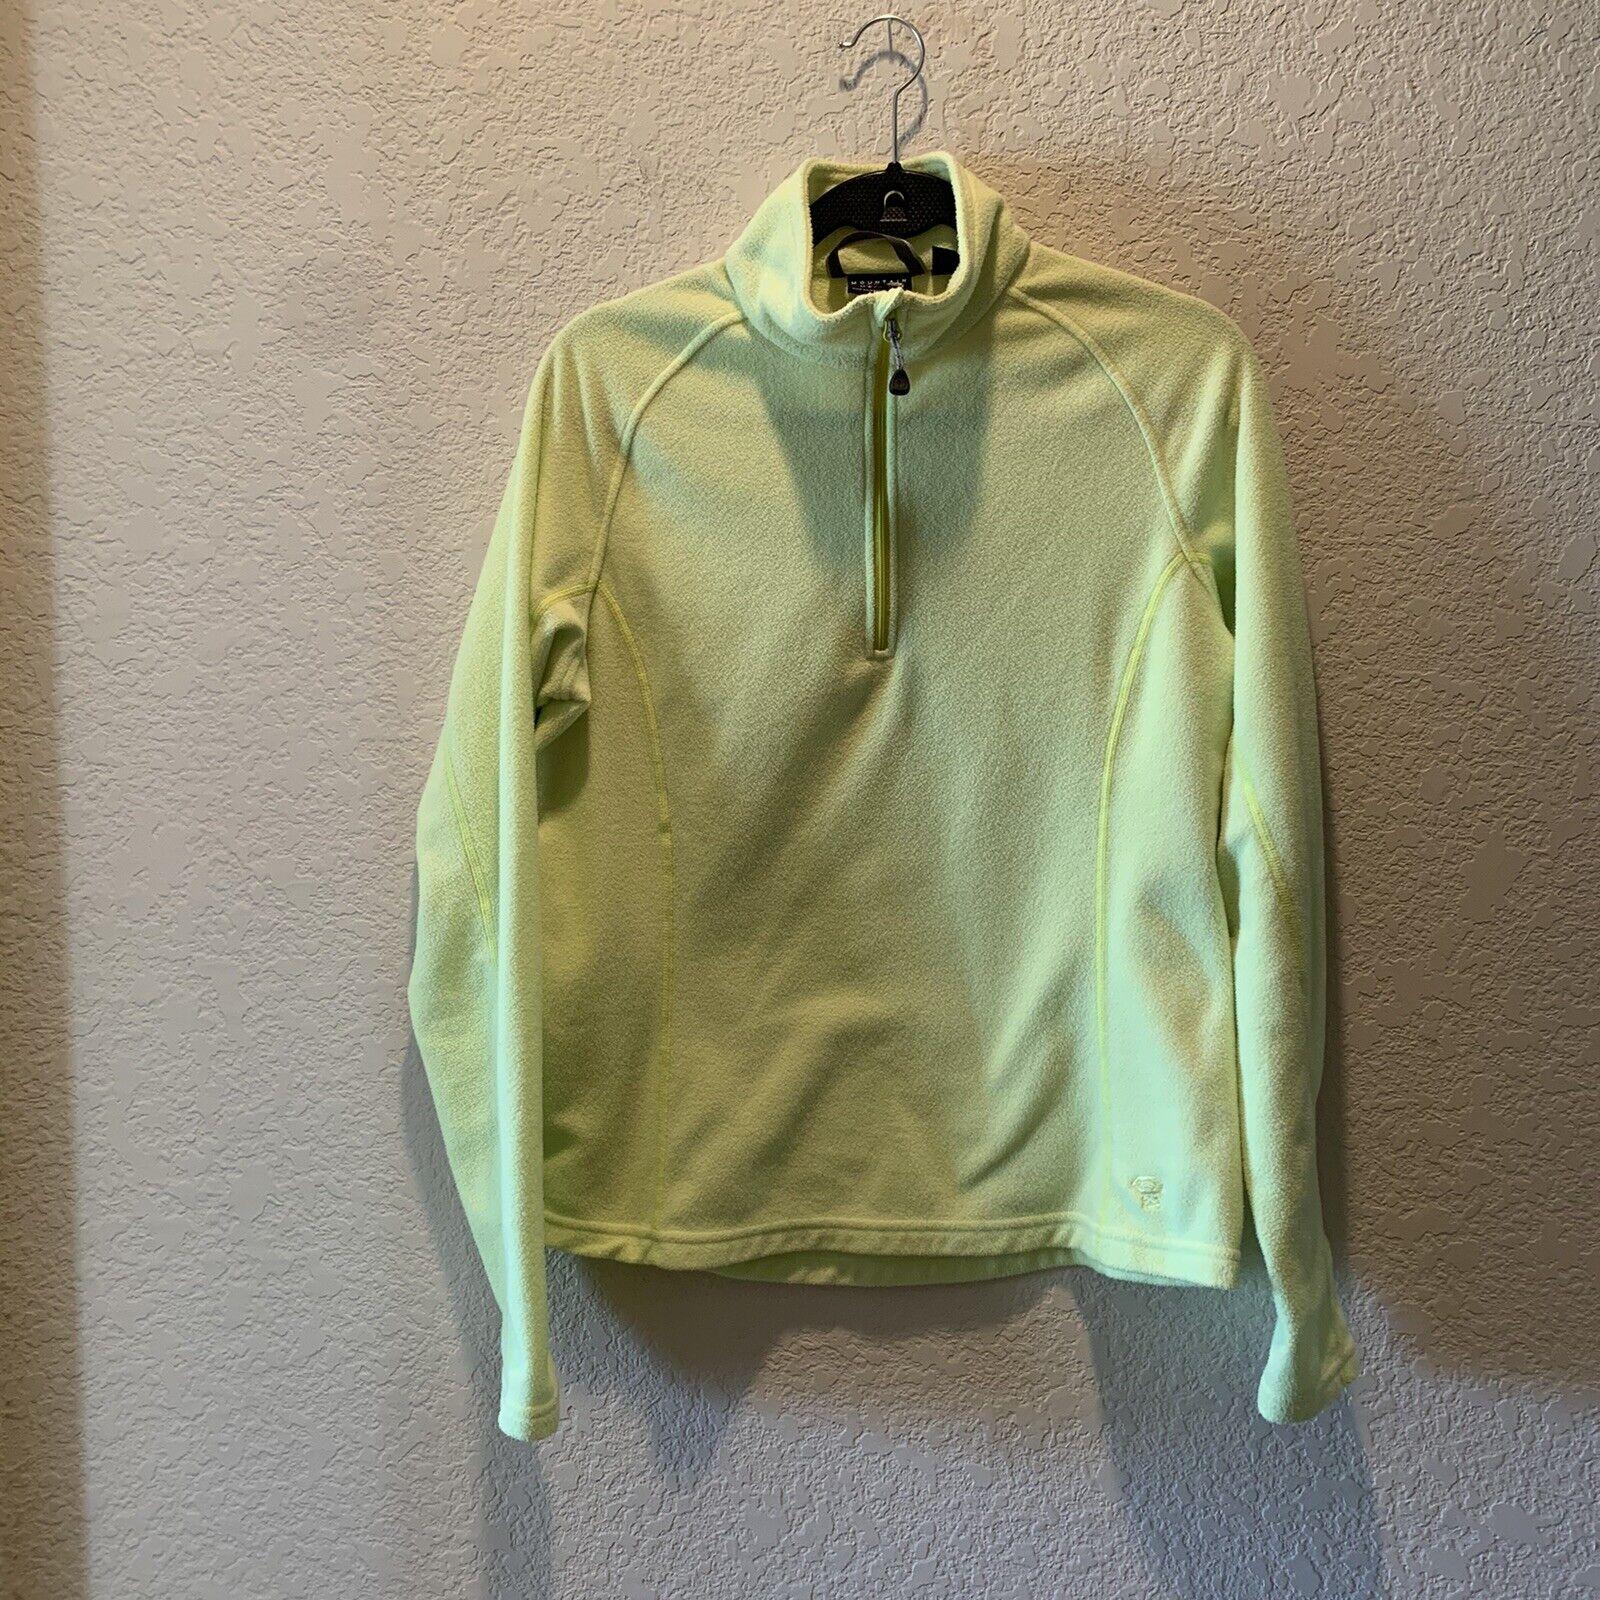 mountain hardwear women 1/4 zip lime lightweight long sleeve pullover fleece top